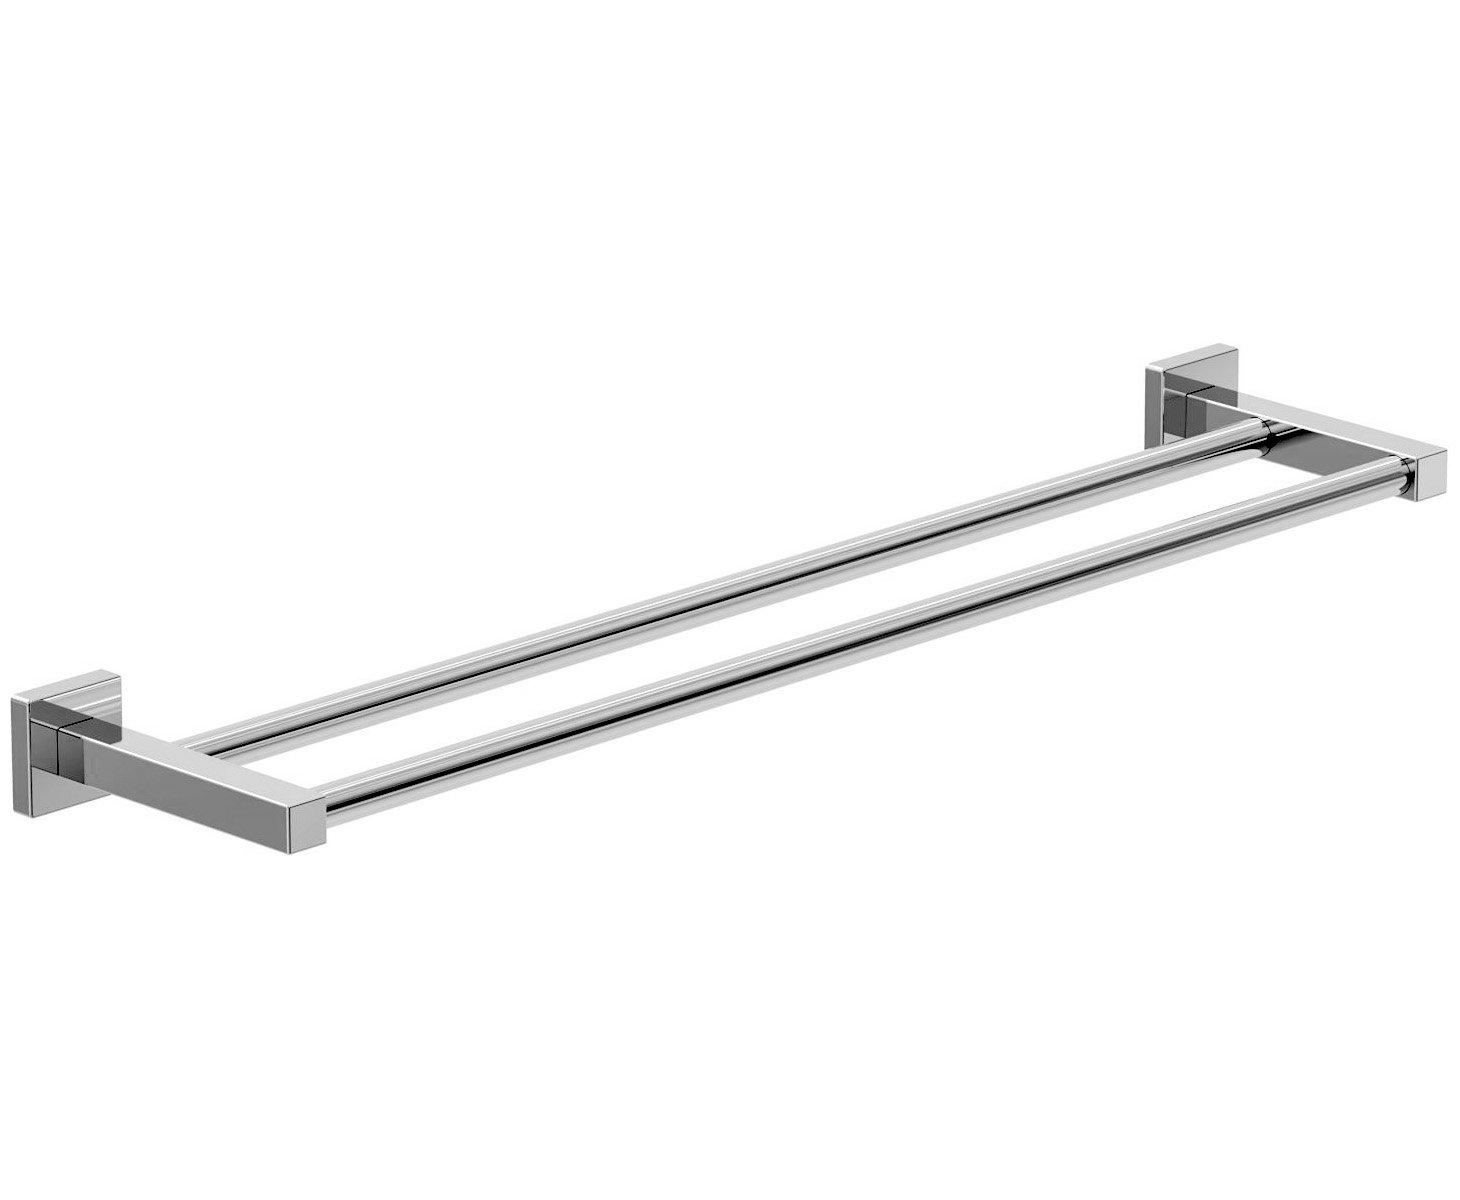 Symmons 363DTB-18 Duro Double Towel Bar, 18-Inch, Chrome Symmons [並行輸入品] B00KRH8LFW